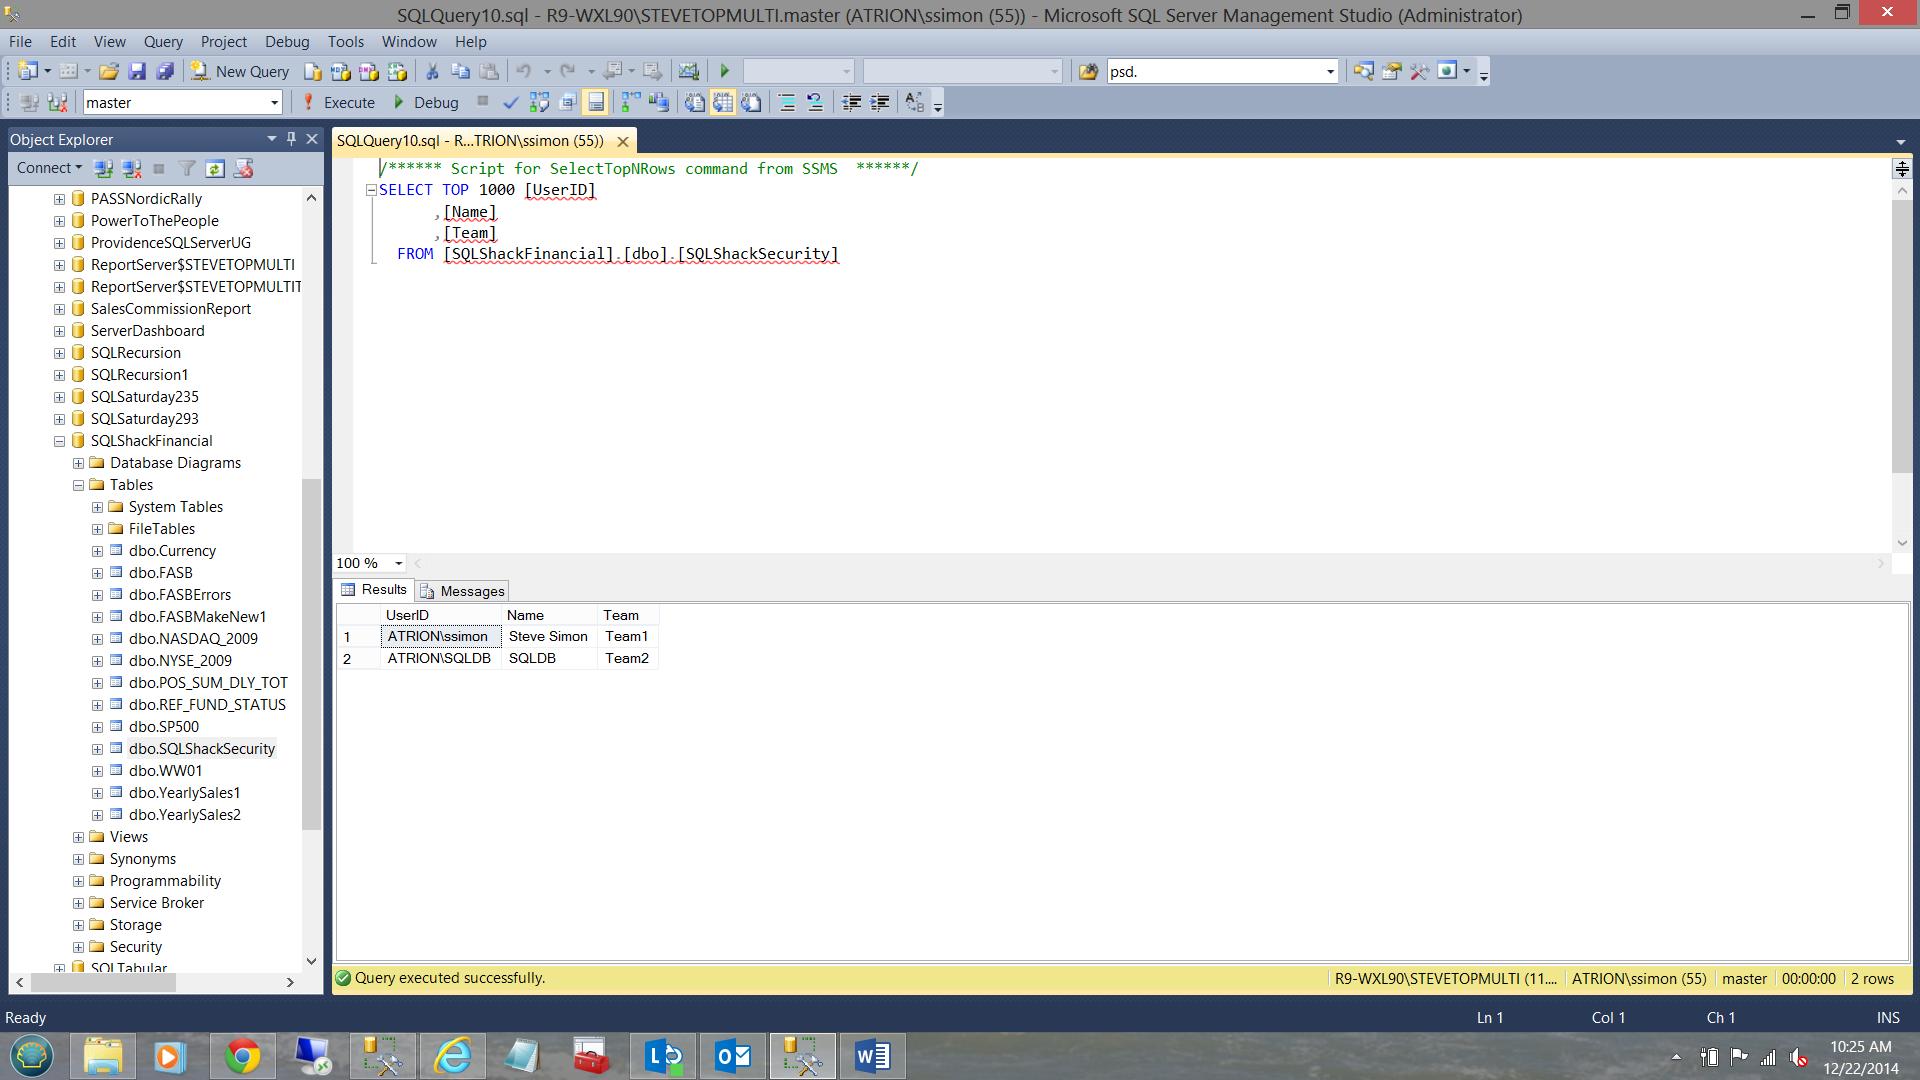 SQL Server安全机制–如何控制用户能够在报告中查看哪些数据3